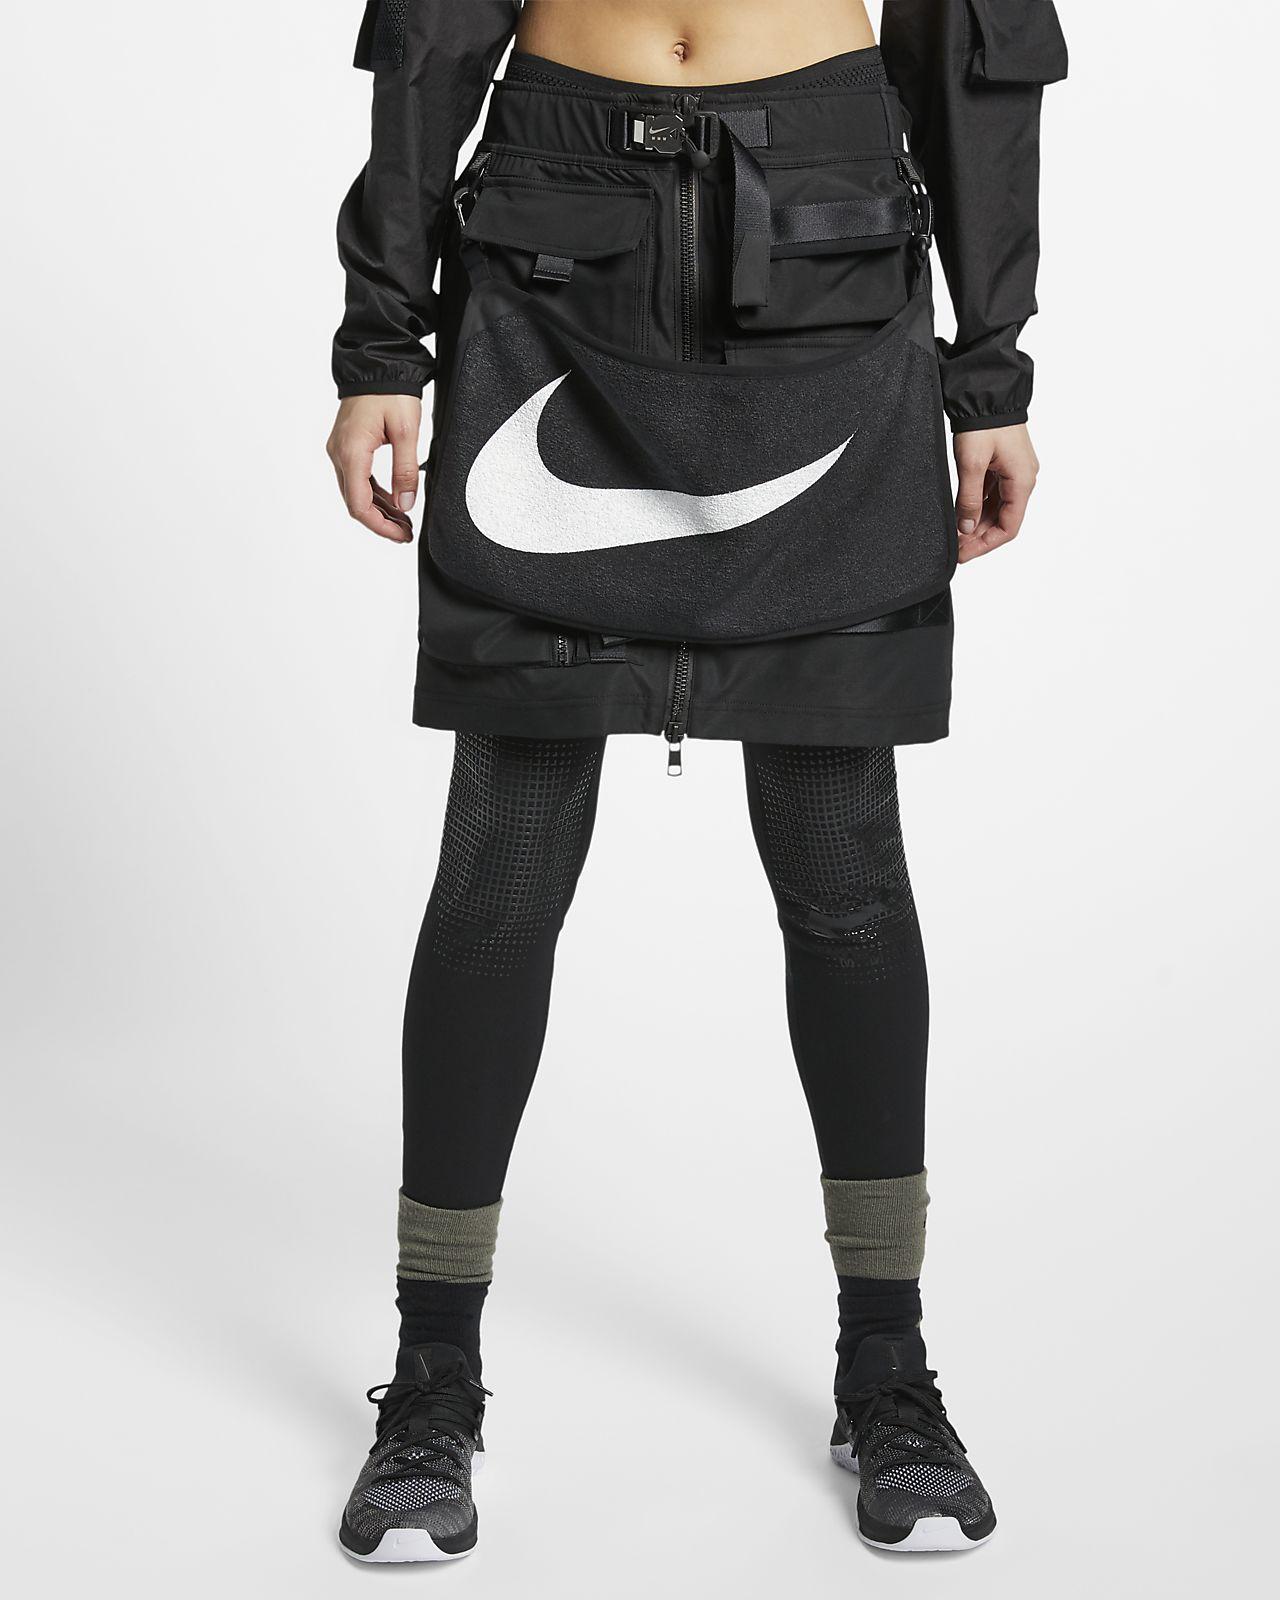 Nike x MMW Women's 2-in-1 Skirt